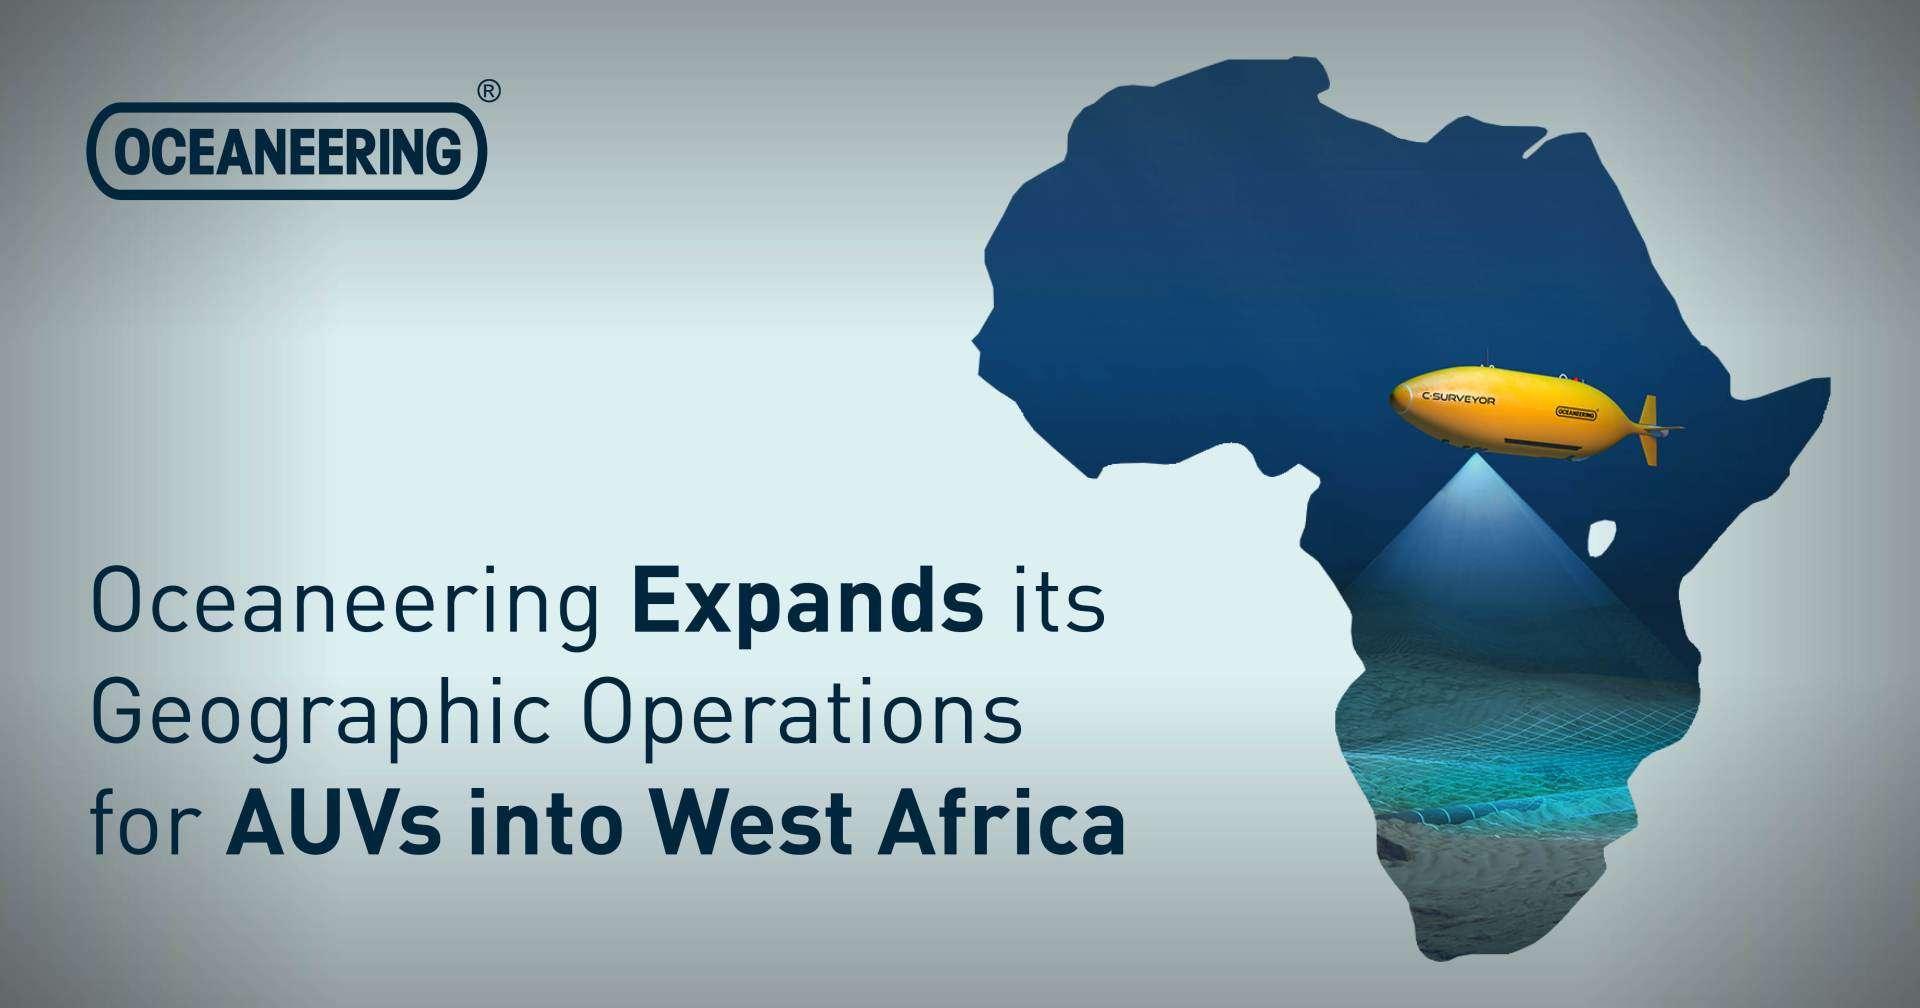 2016-oceaneering-mobilizes-auv-in-west-africa-rev1-sm